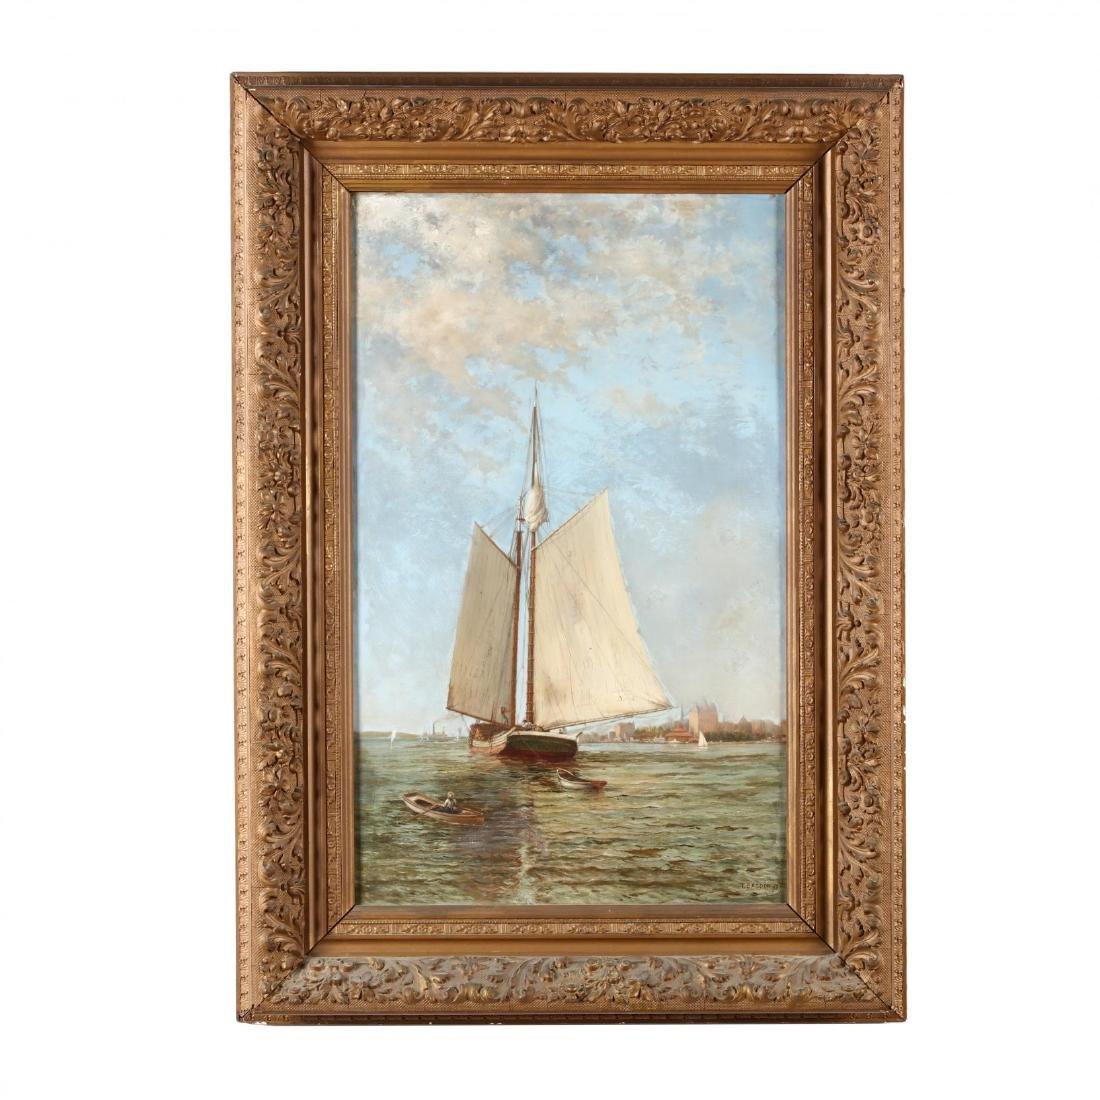 T. Basden (English, 19th century), Harbor Scene